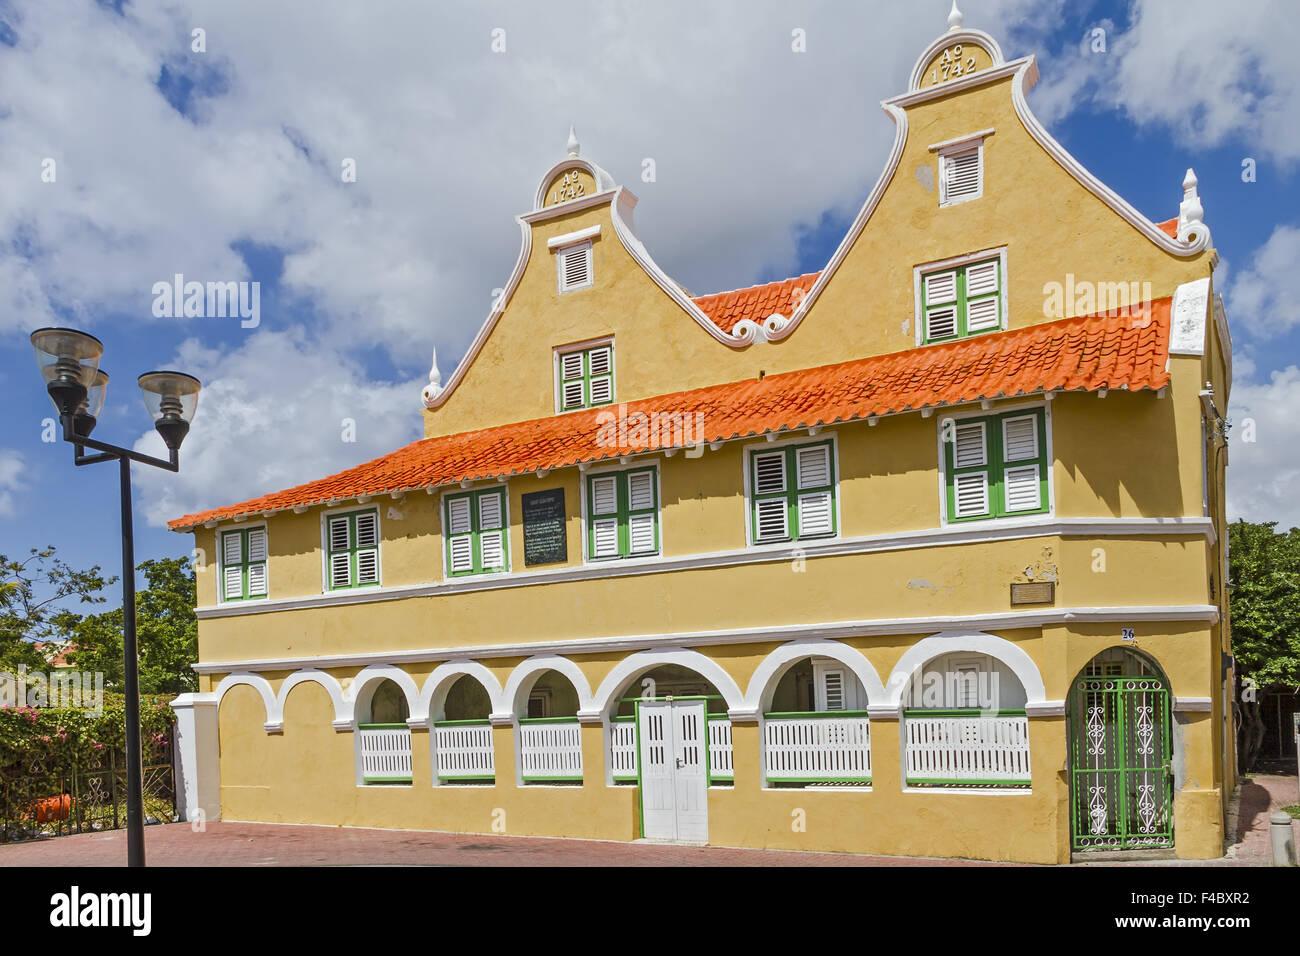 Villa Sebastopol Willemstad Curacao - Stock Image